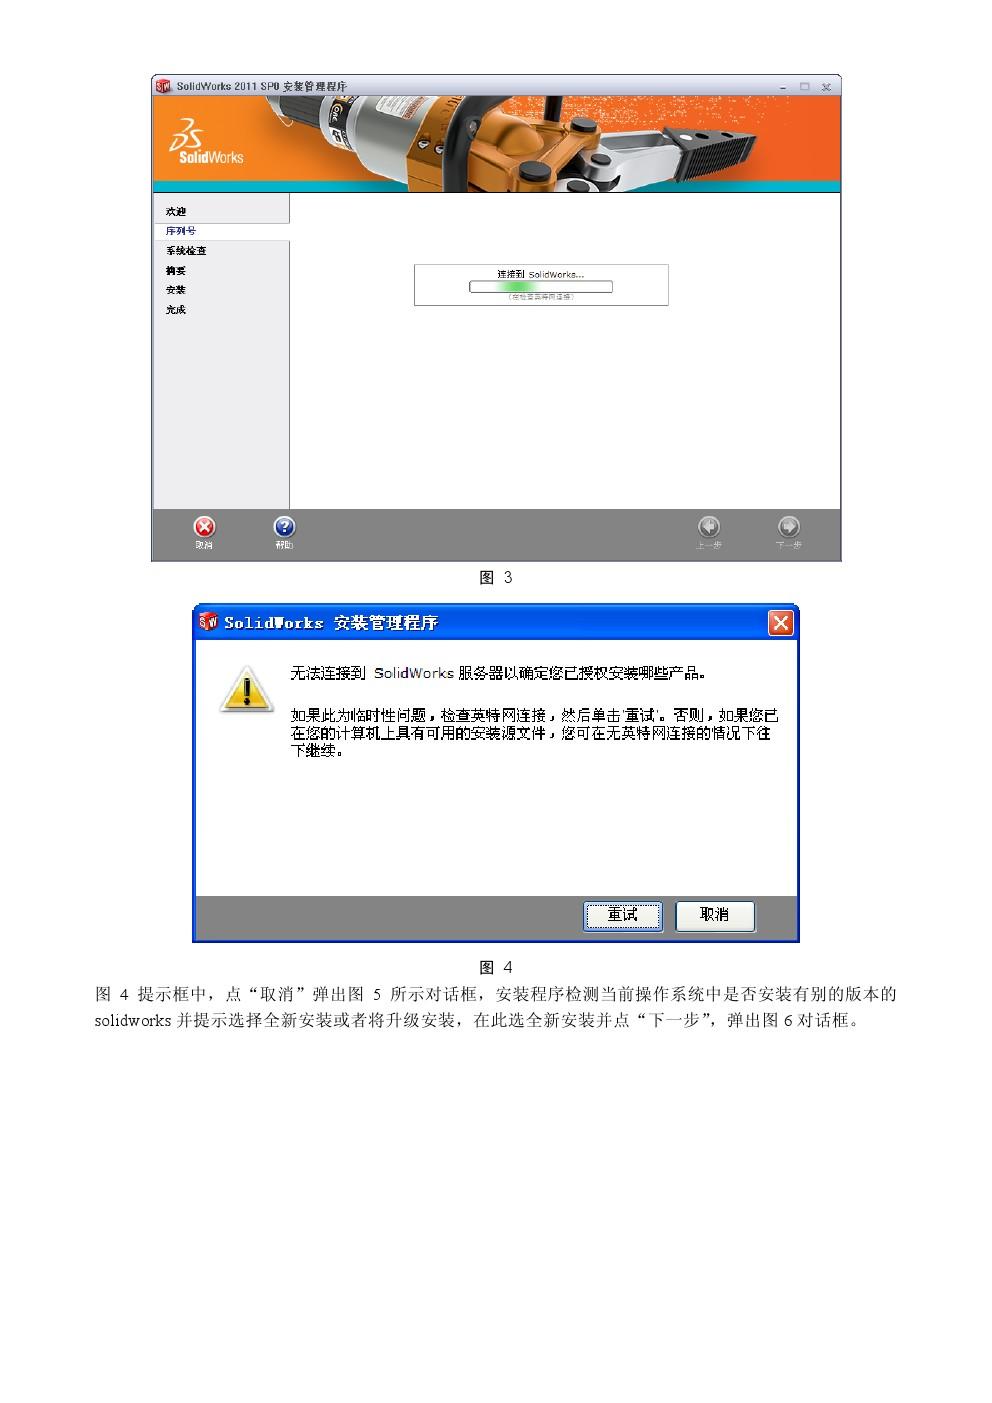 solidworks2011 安装及破解方法